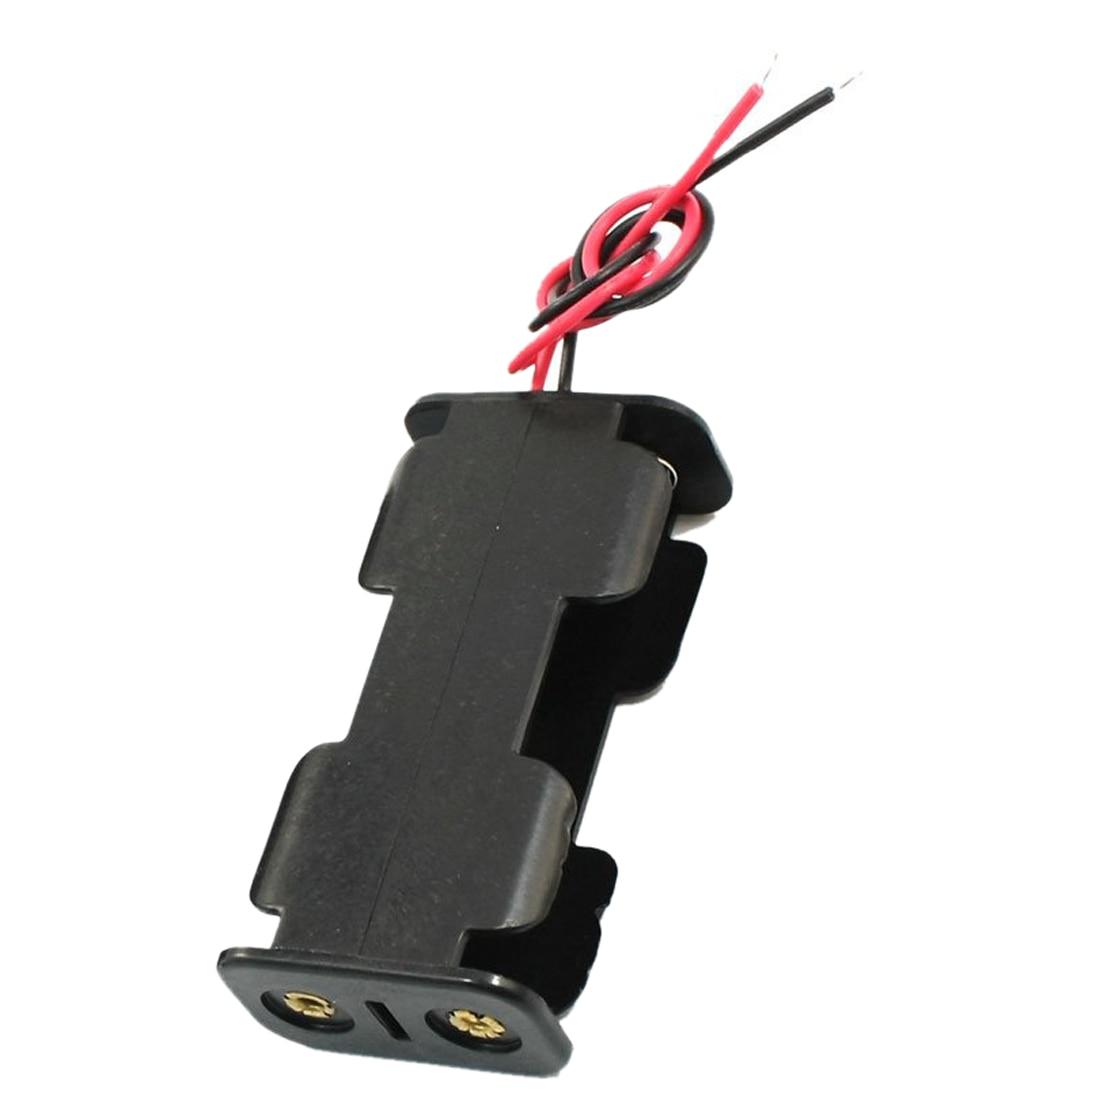 2Pcs Double Side Opening Frame 2 x 1.5V AA Battery Case Holder Black